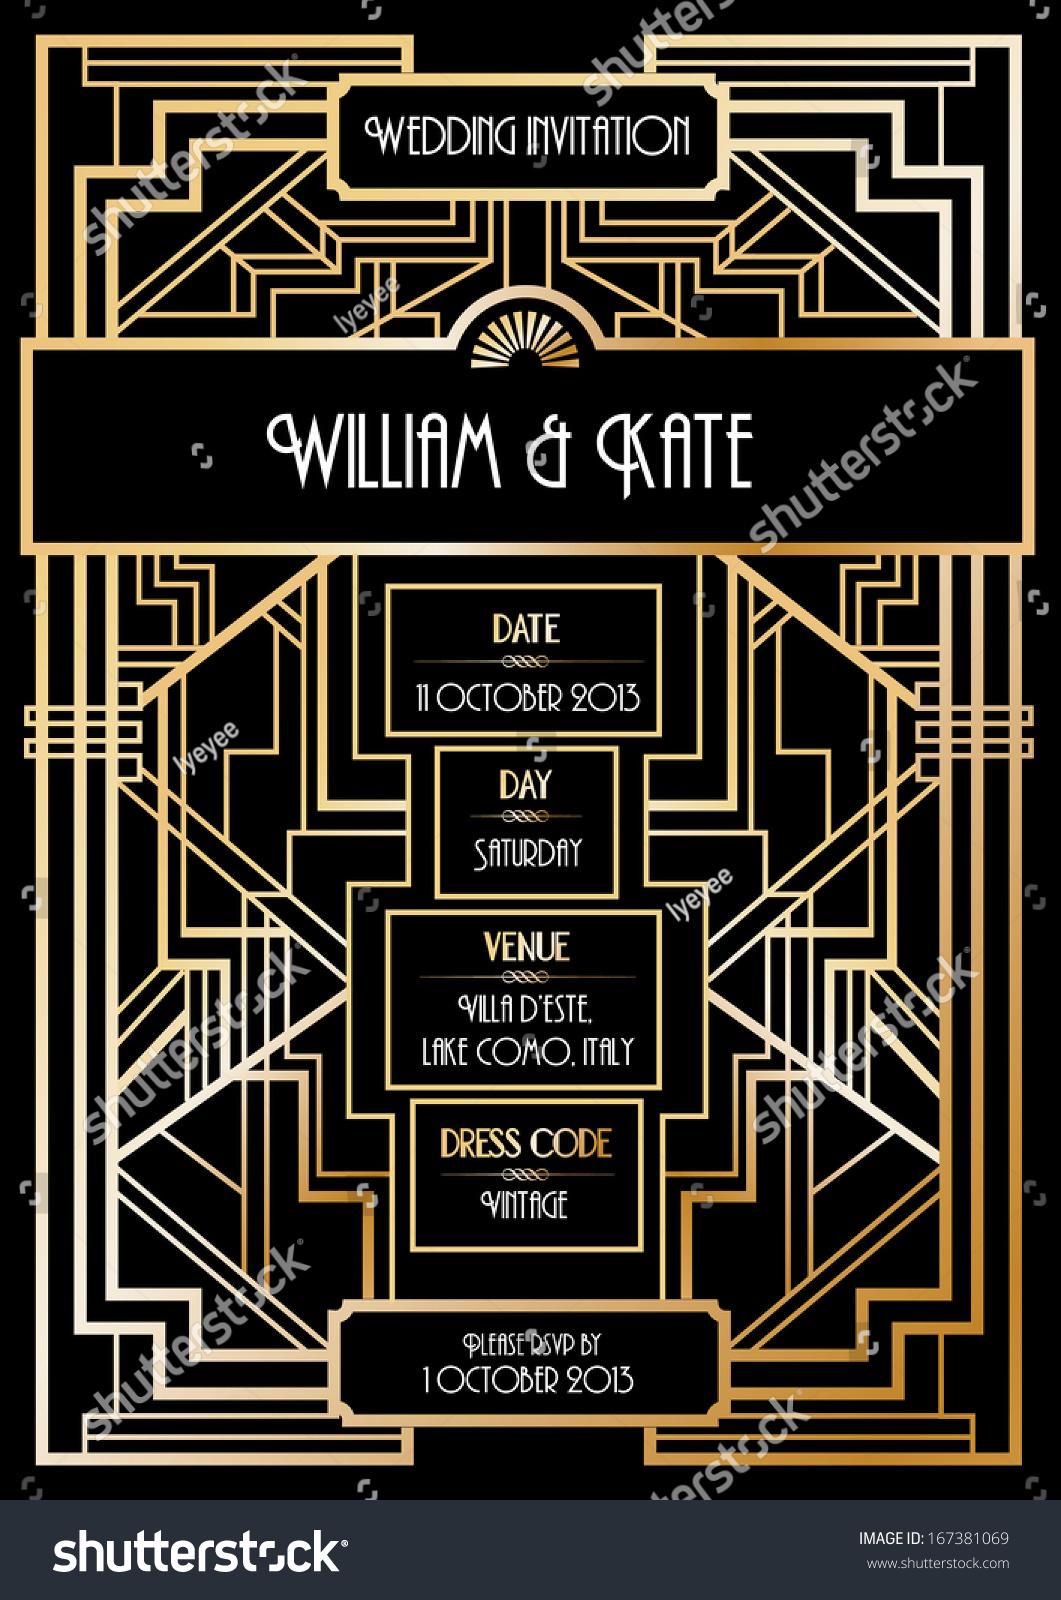 royalty free art deco wedding invitation card 167381069 stock